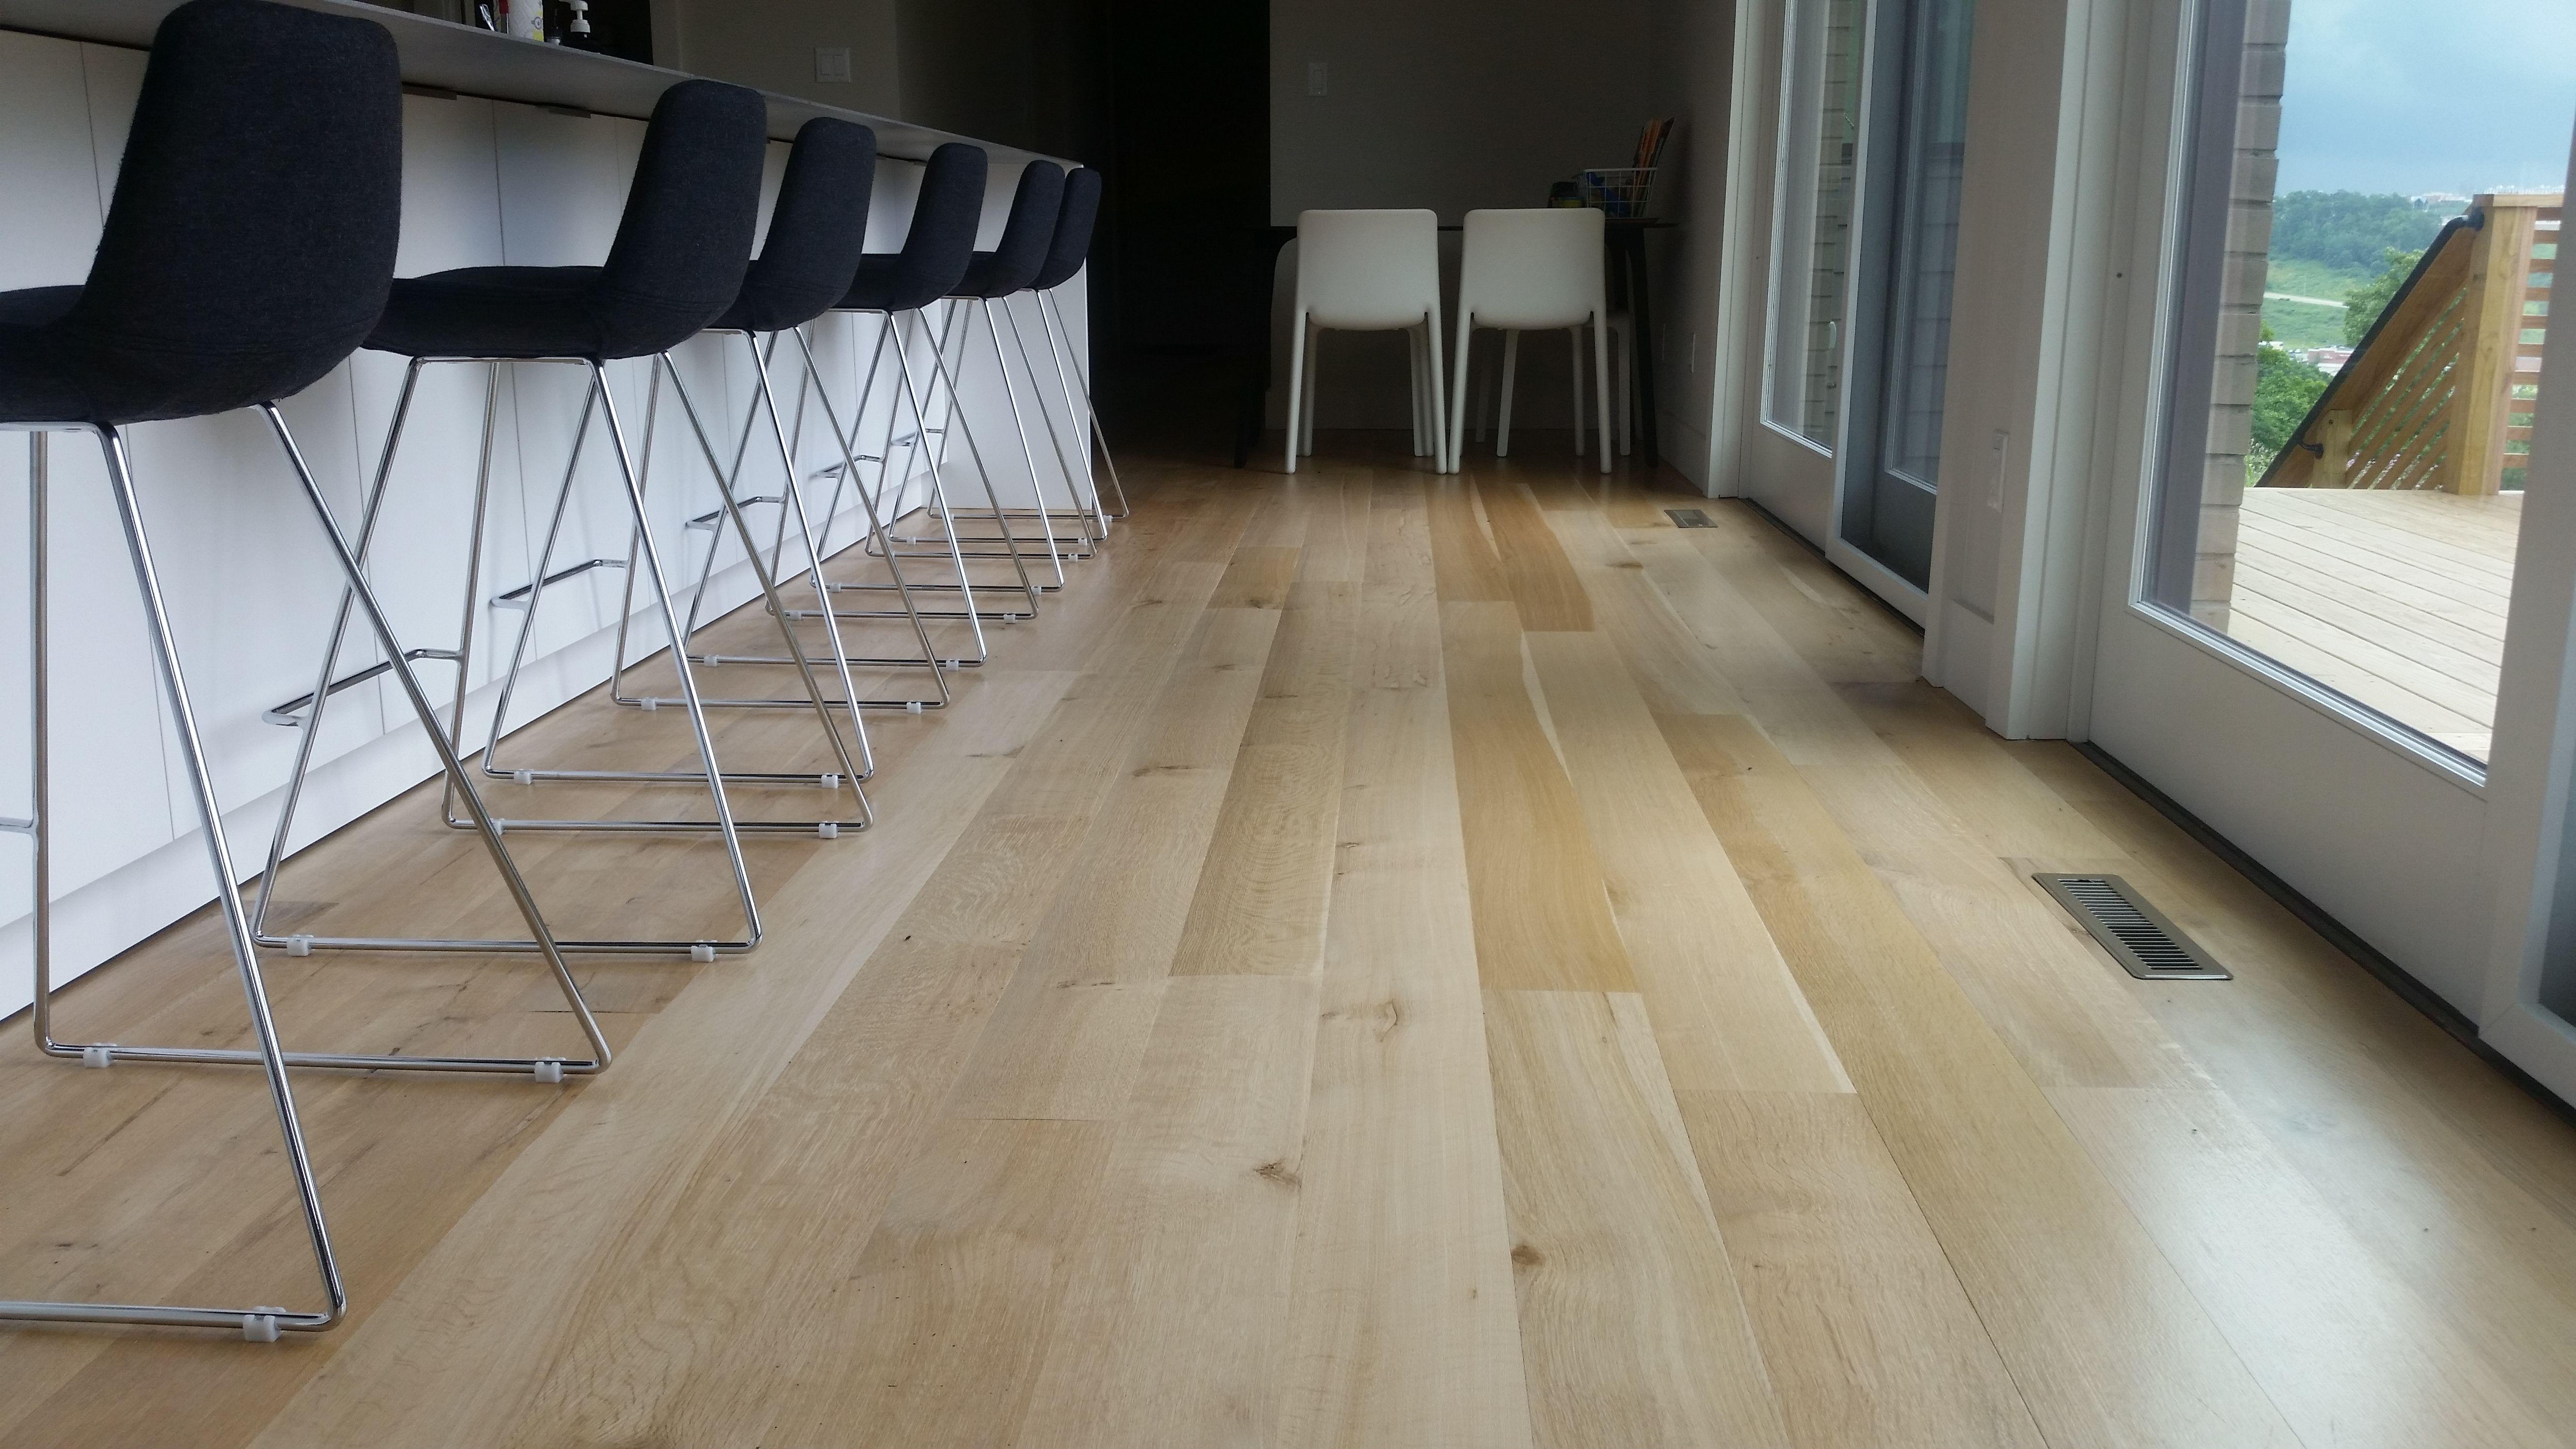 Allegheny Mountain Hardwood Flooring Inspiration Gallery Hardwood Floors Flooring Hardwood